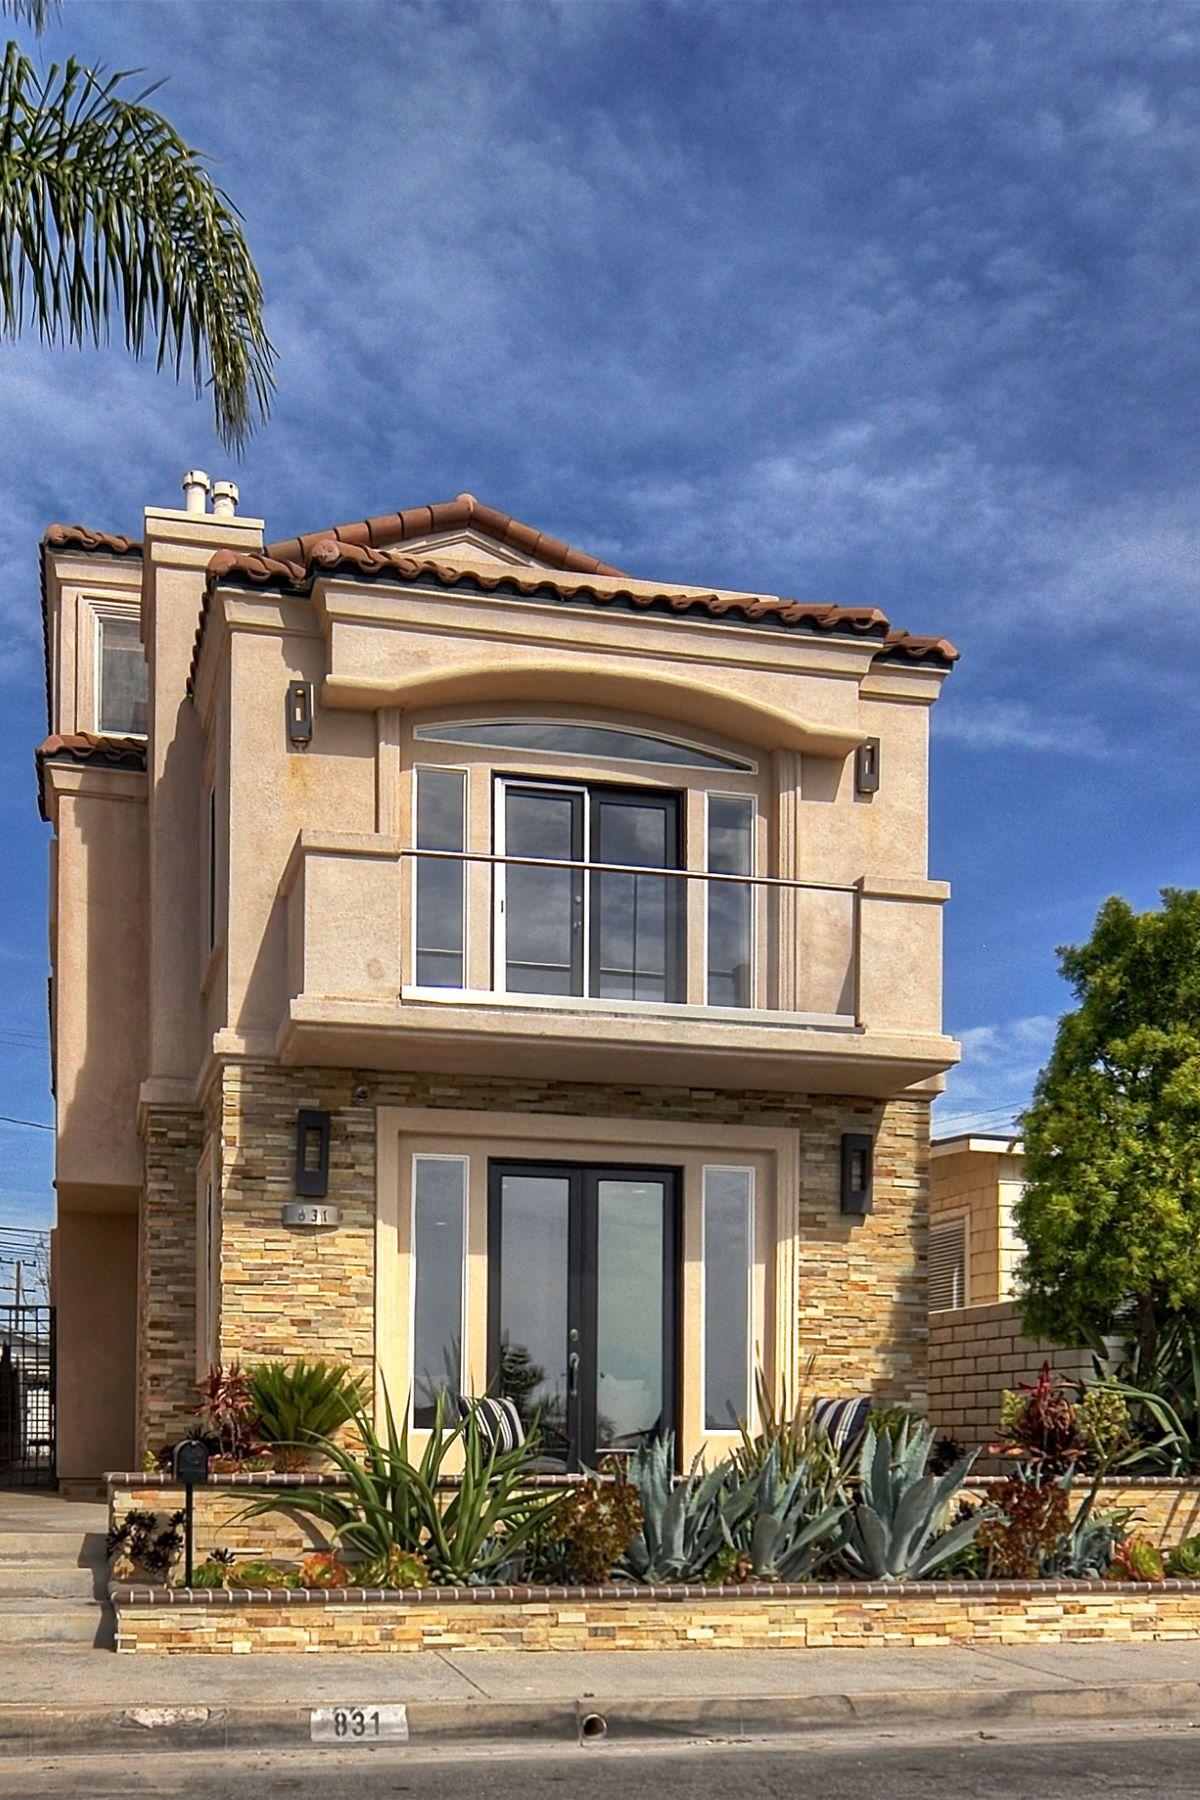 Single Family Home for Sale at 831 Frankfort Avenue Huntington Beach, California, 92648 United States